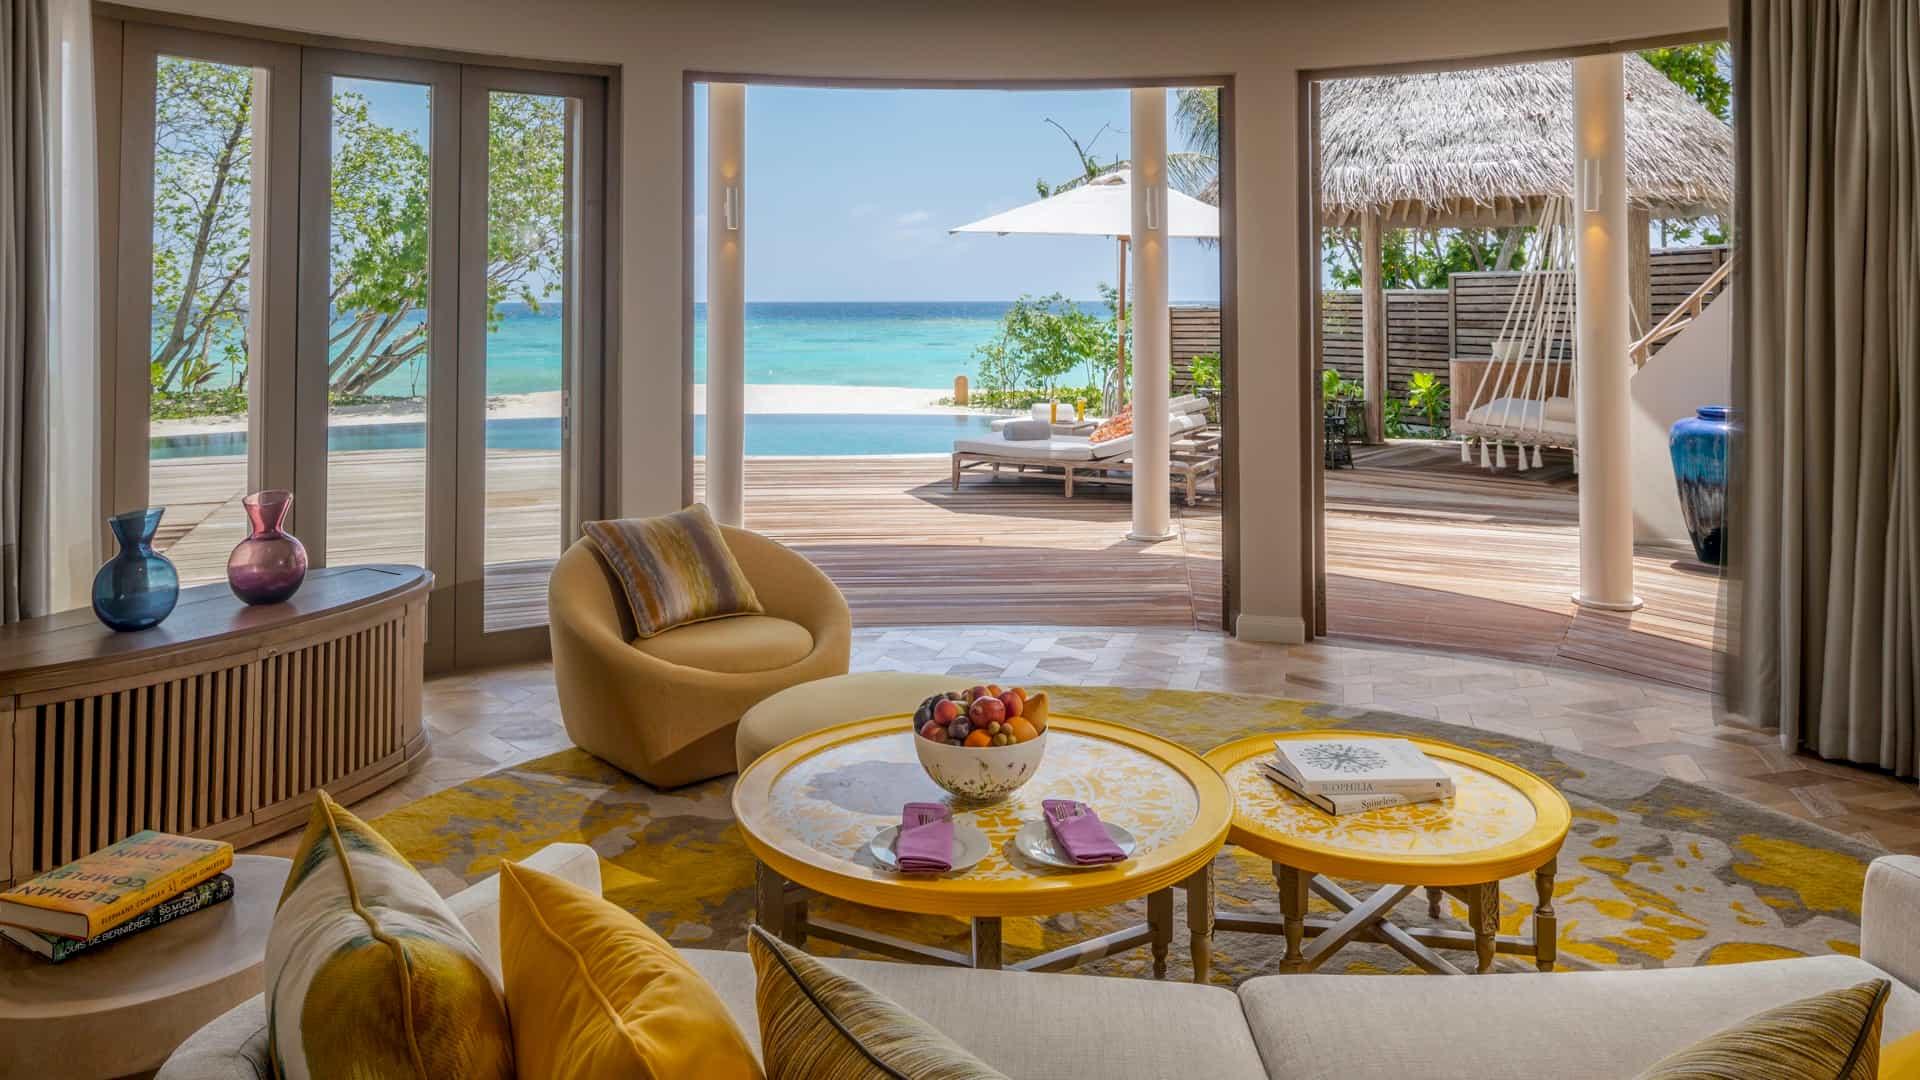 Resort Maldive The Nautilus Maldives beach residence